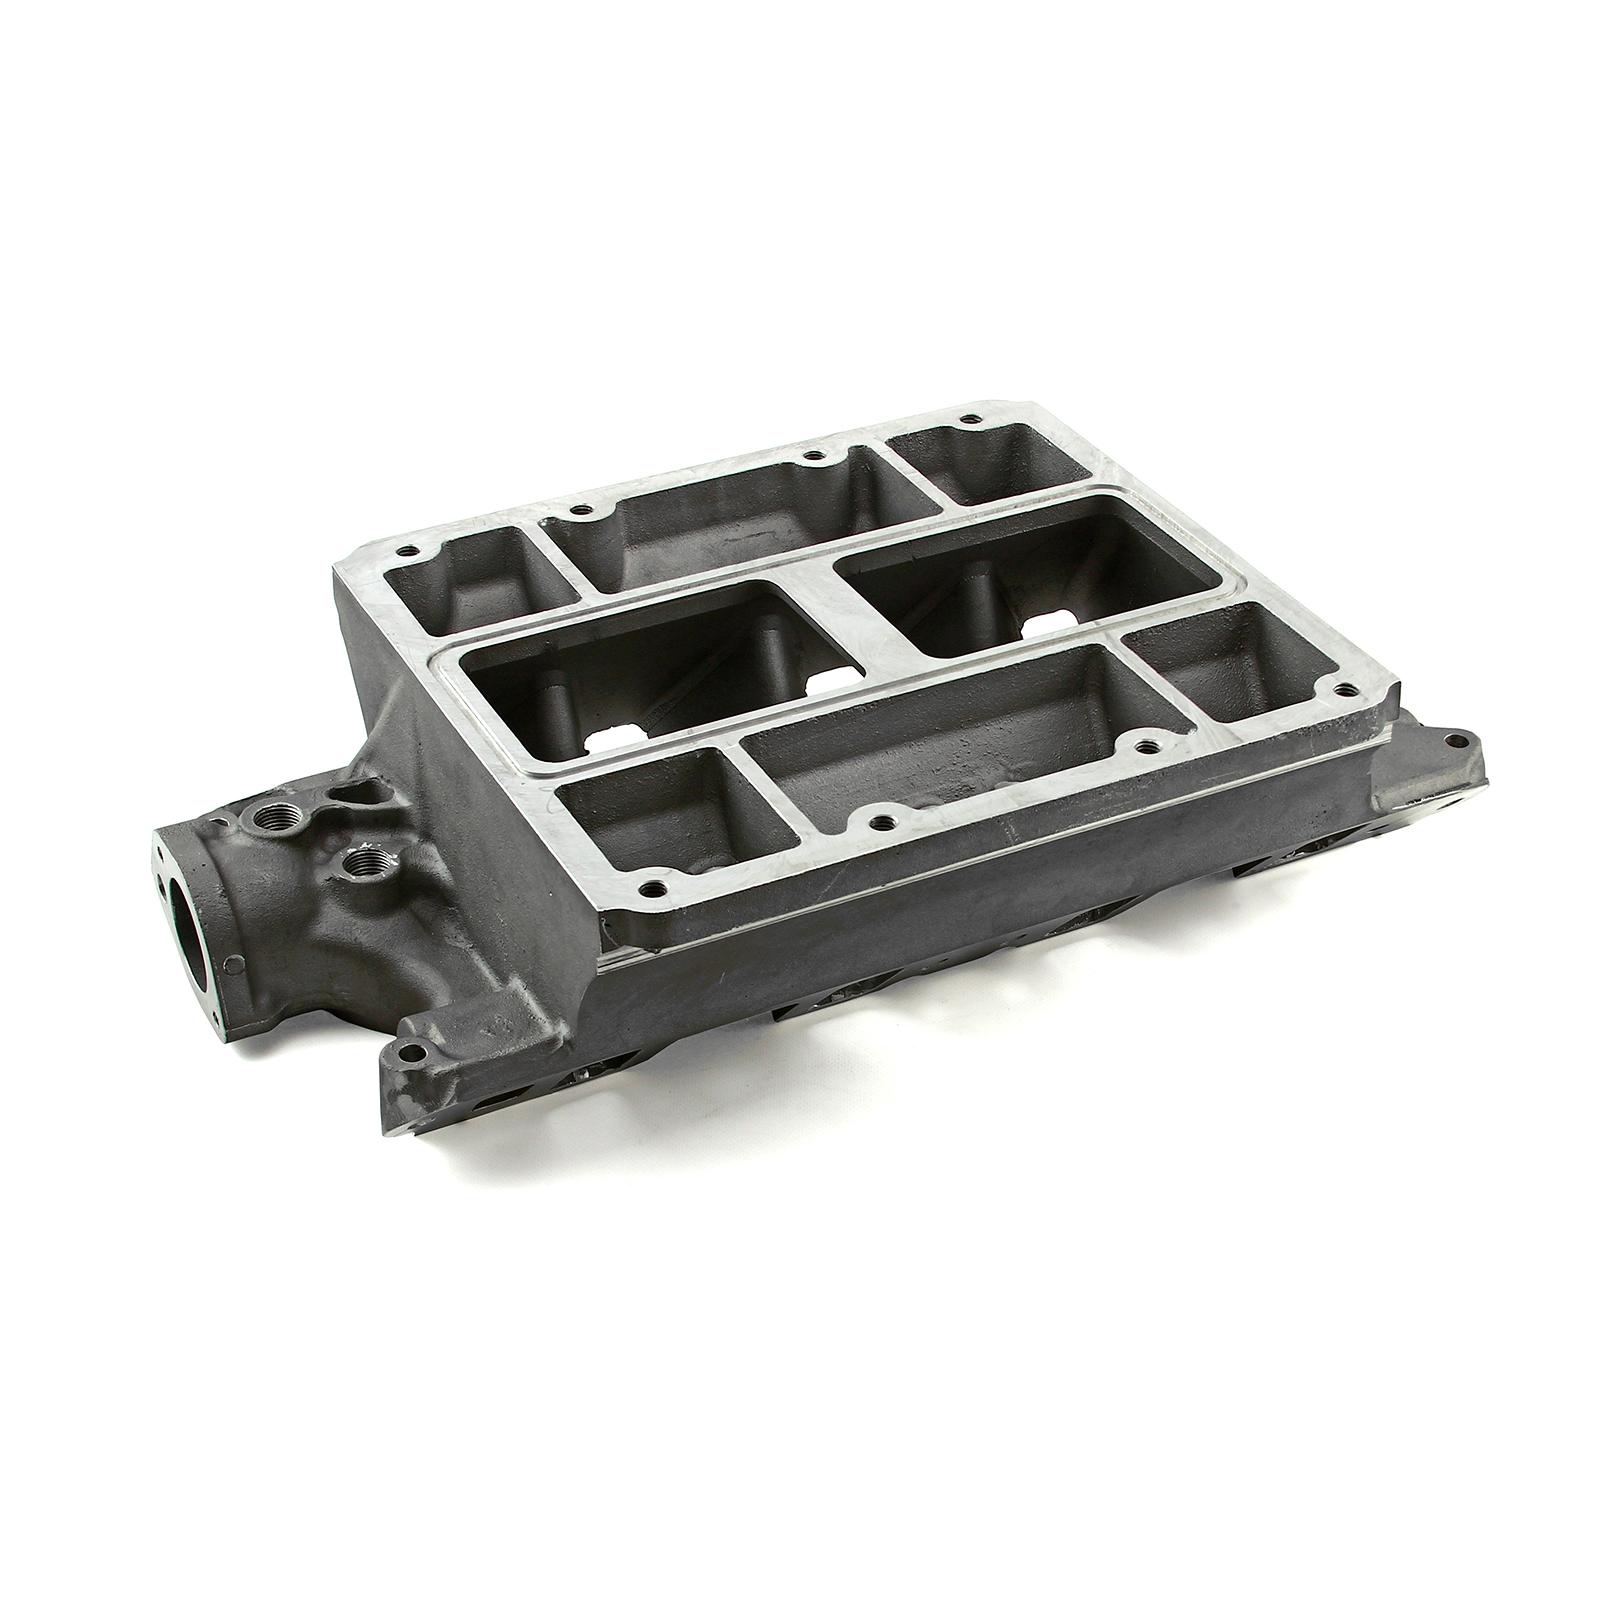 Ford SB 289 302 Windsor 6-71 8-71 Supercharger Aluminum Intake Manifold Satin